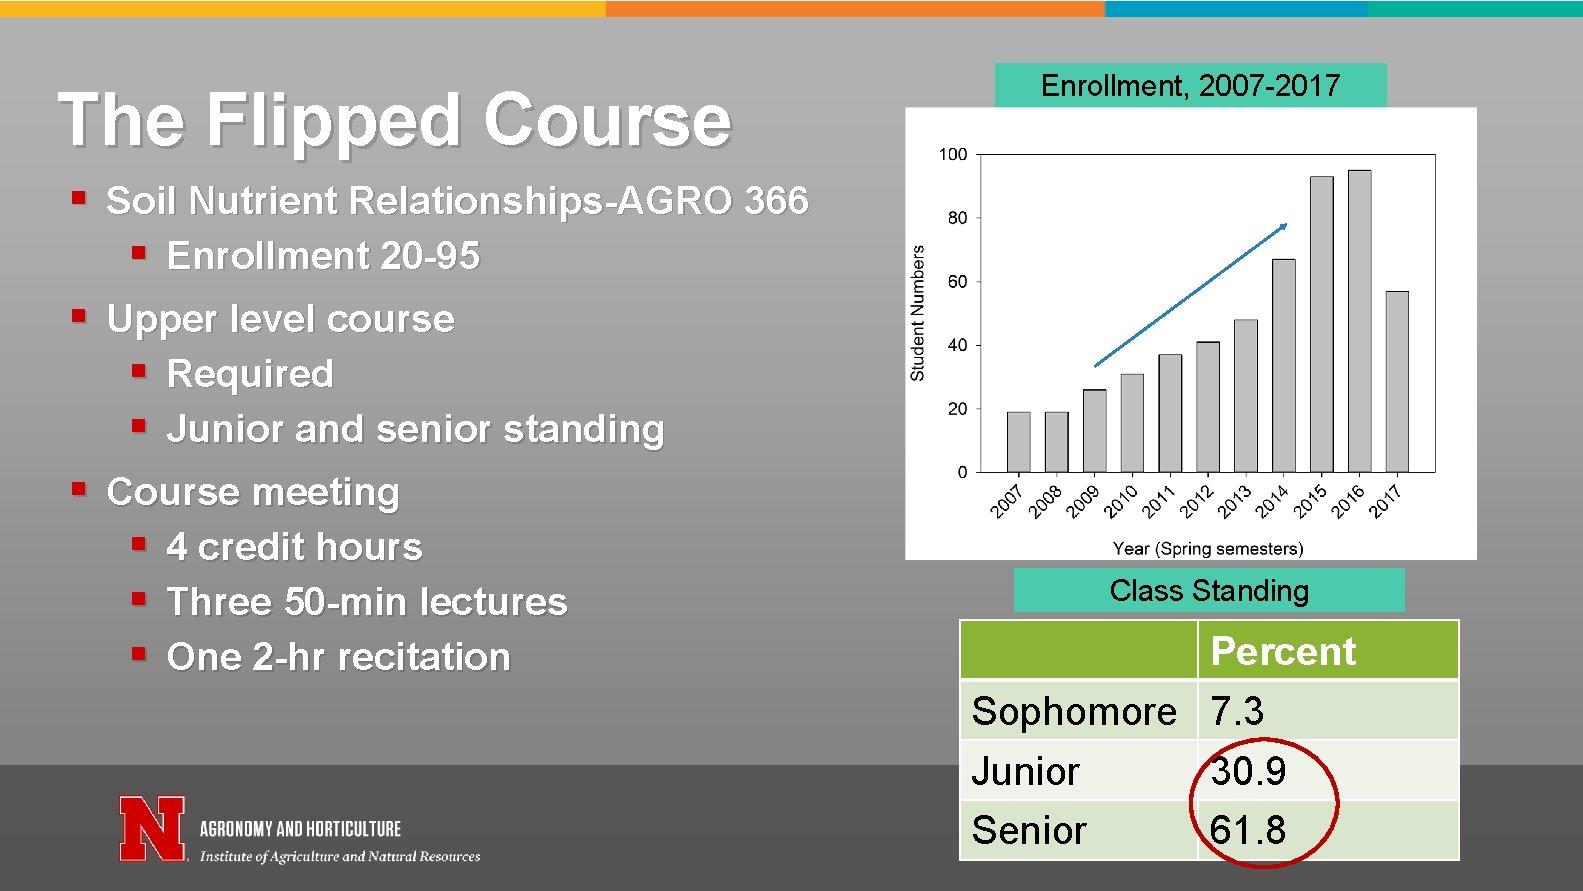 The Flipped Course § Soil Nutrient Relationships-AGRO 366 § Enrollment 20 -95 § Upper